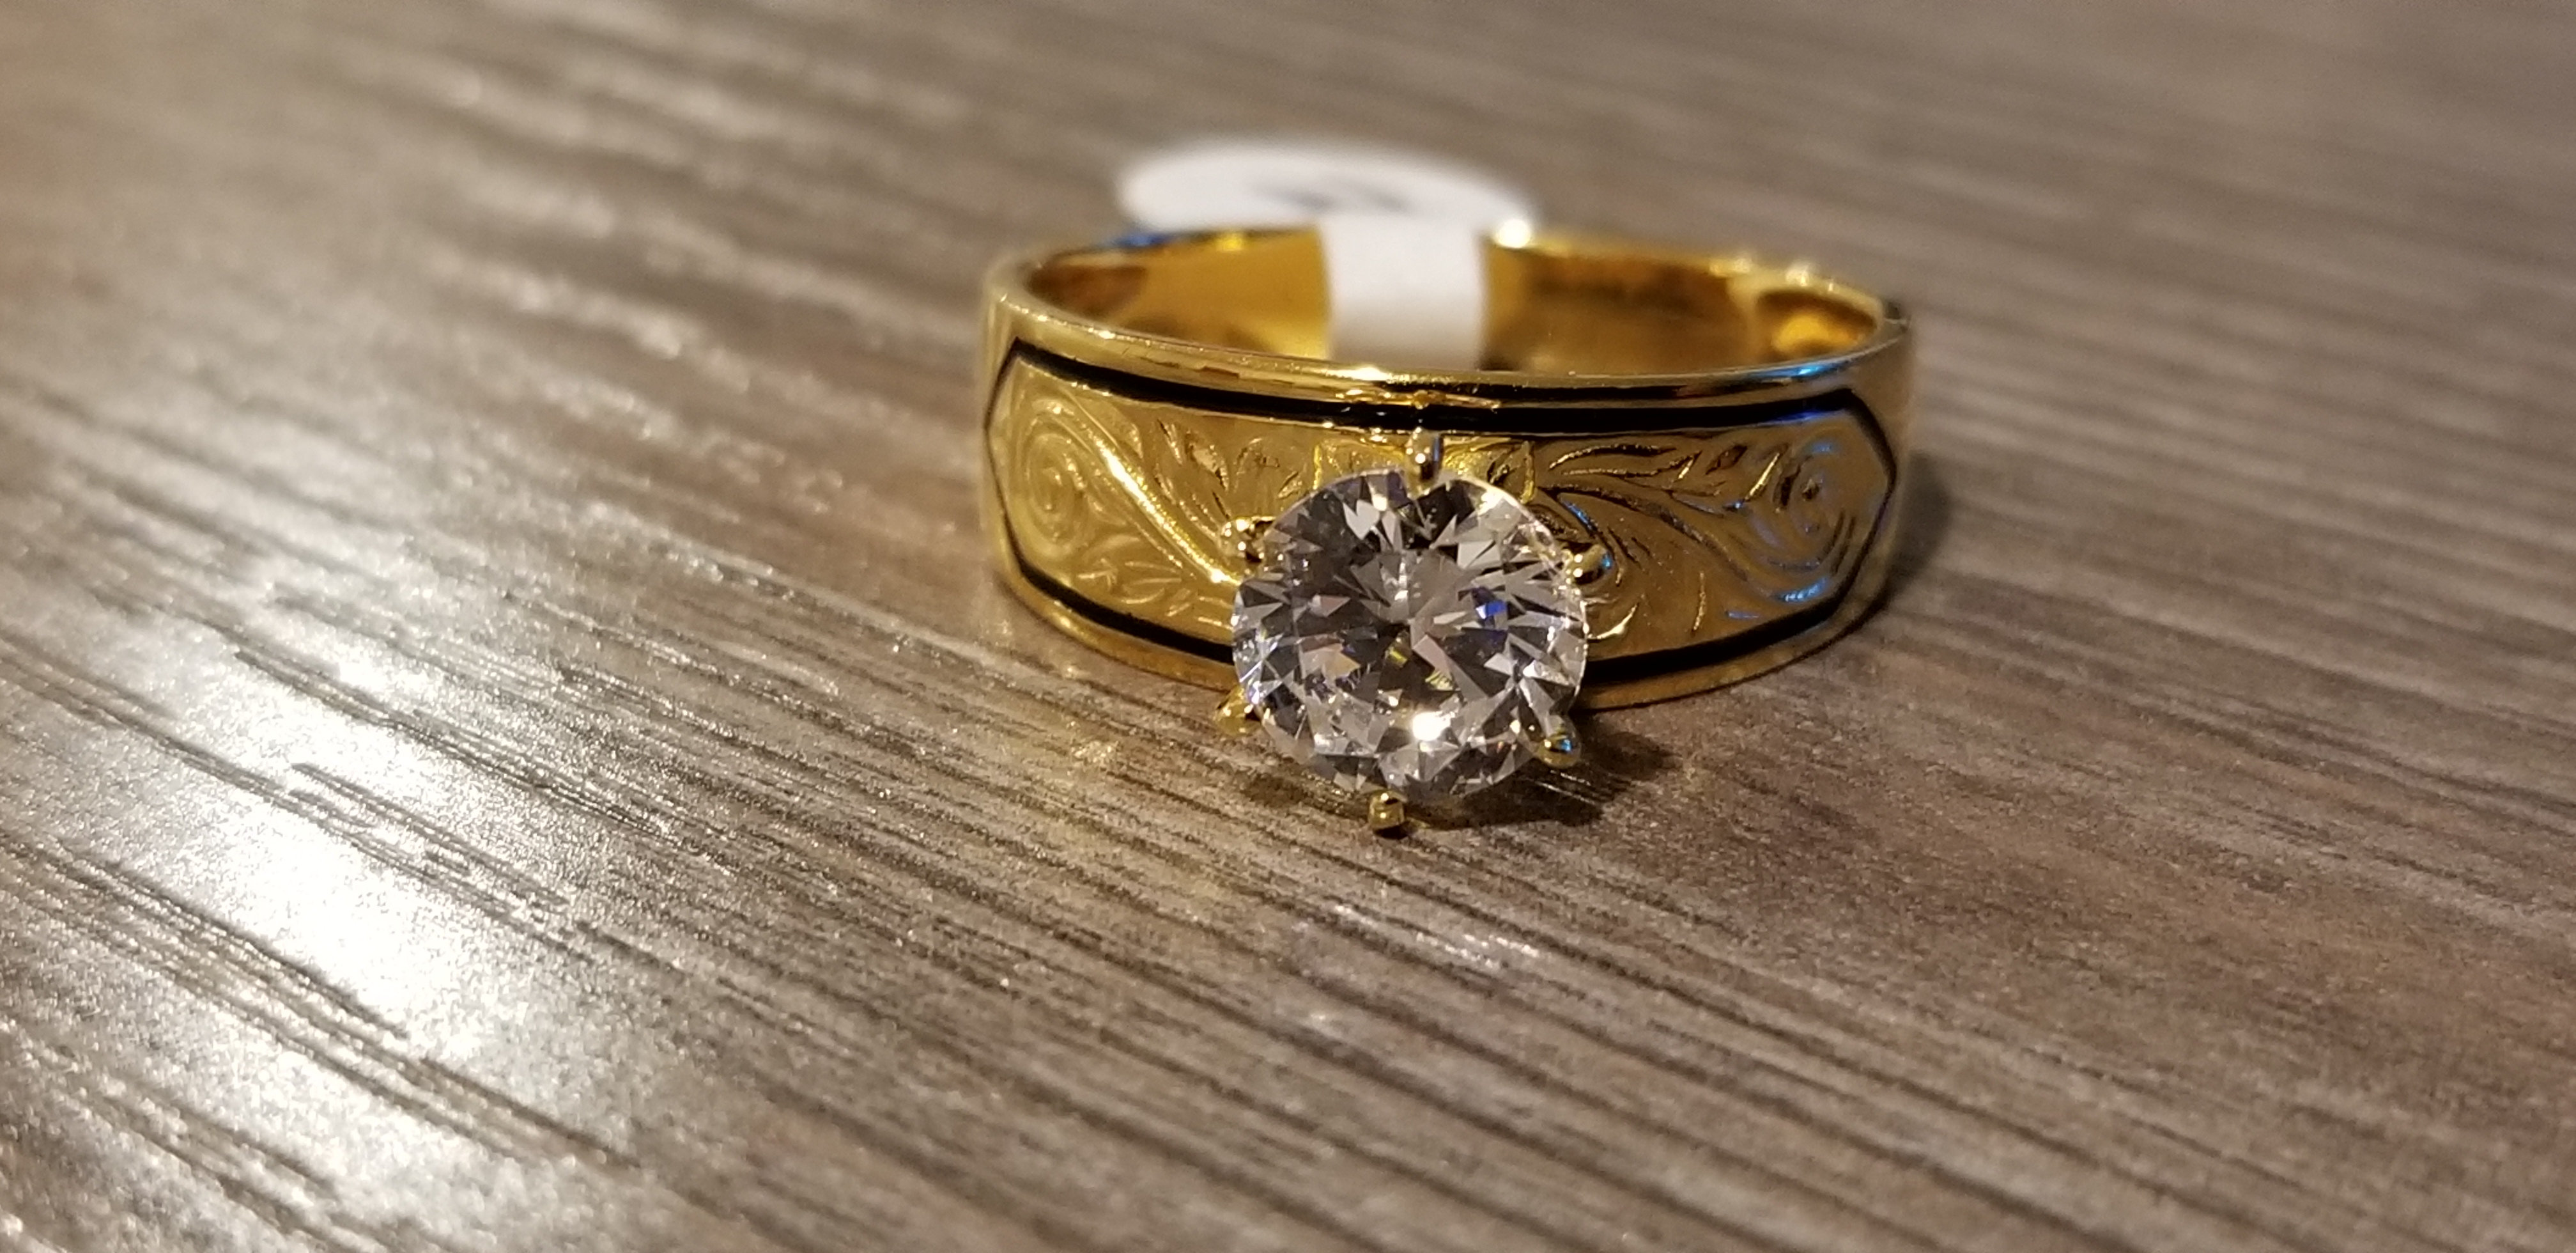 Sterling Silver 8 MM CZ Ring MSRP $62